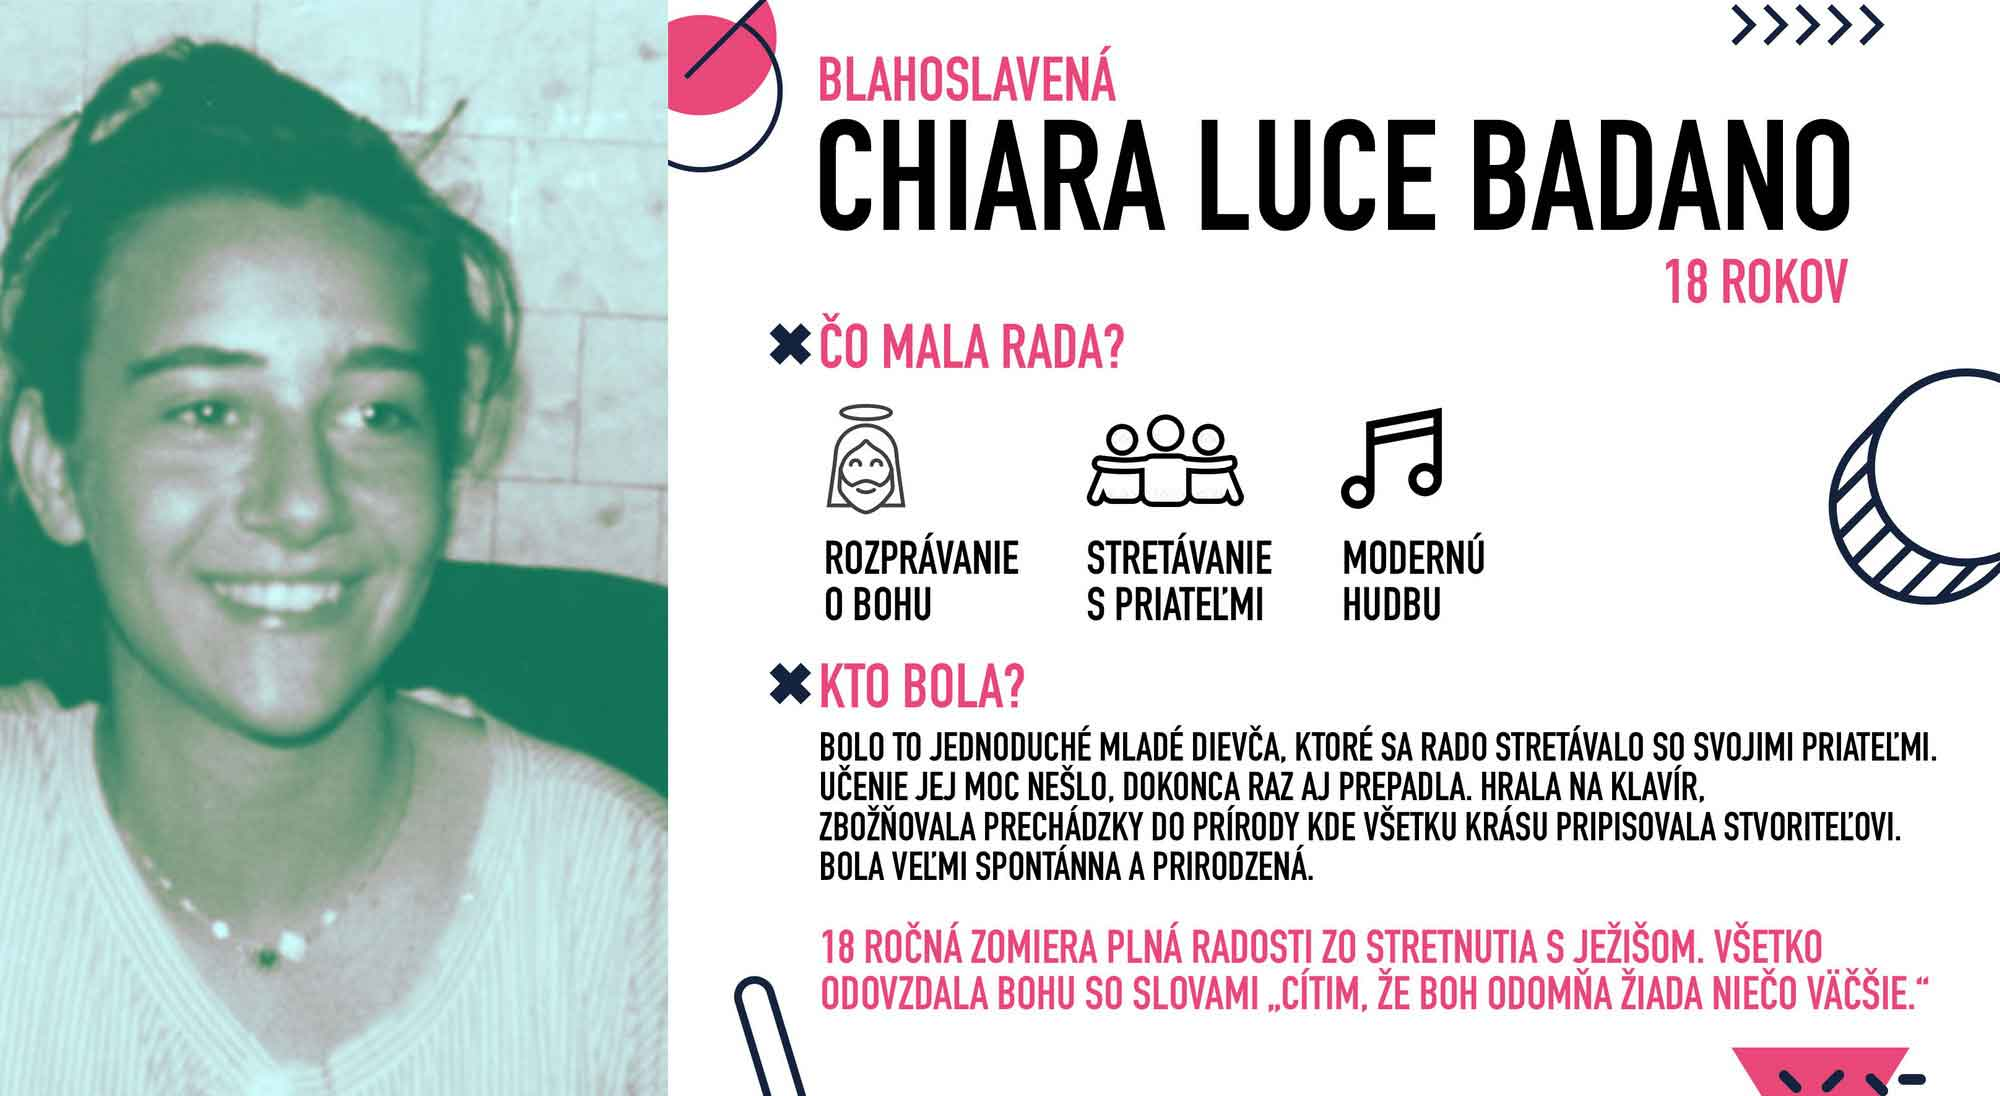 Chiara-Luce-Badano